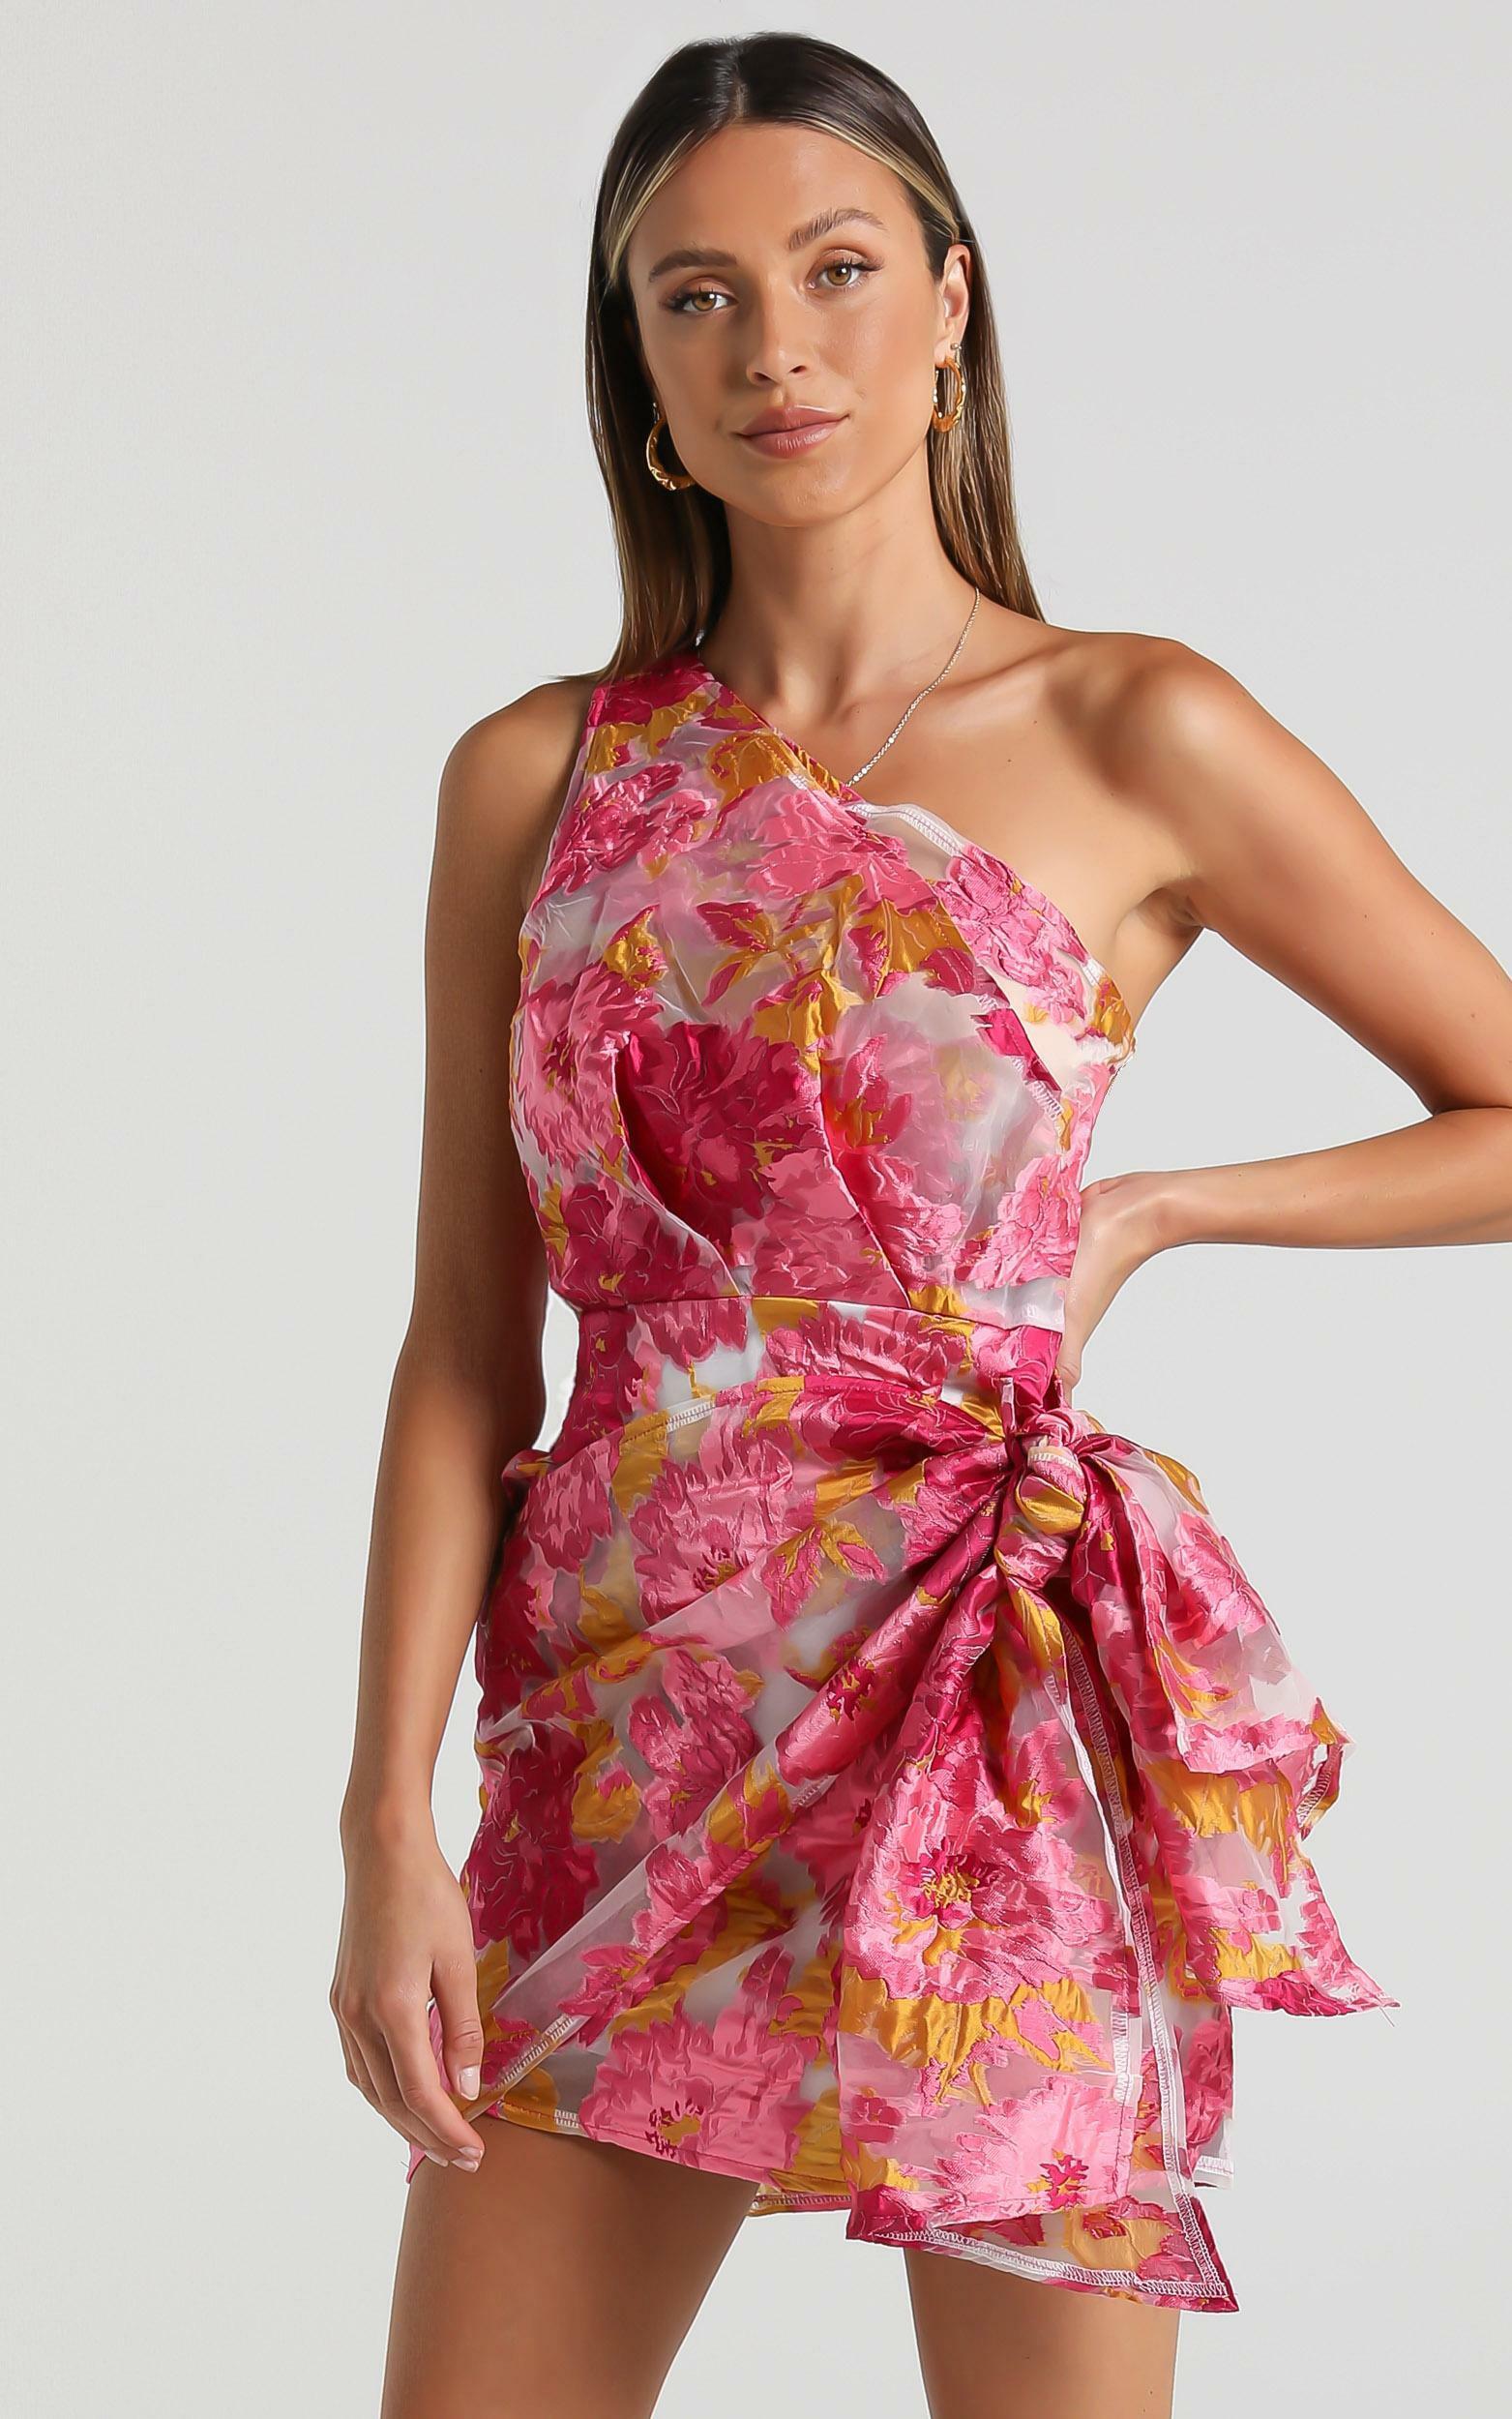 Brailey Dress in Pink Floral - 06, PNK1, hi-res image number null